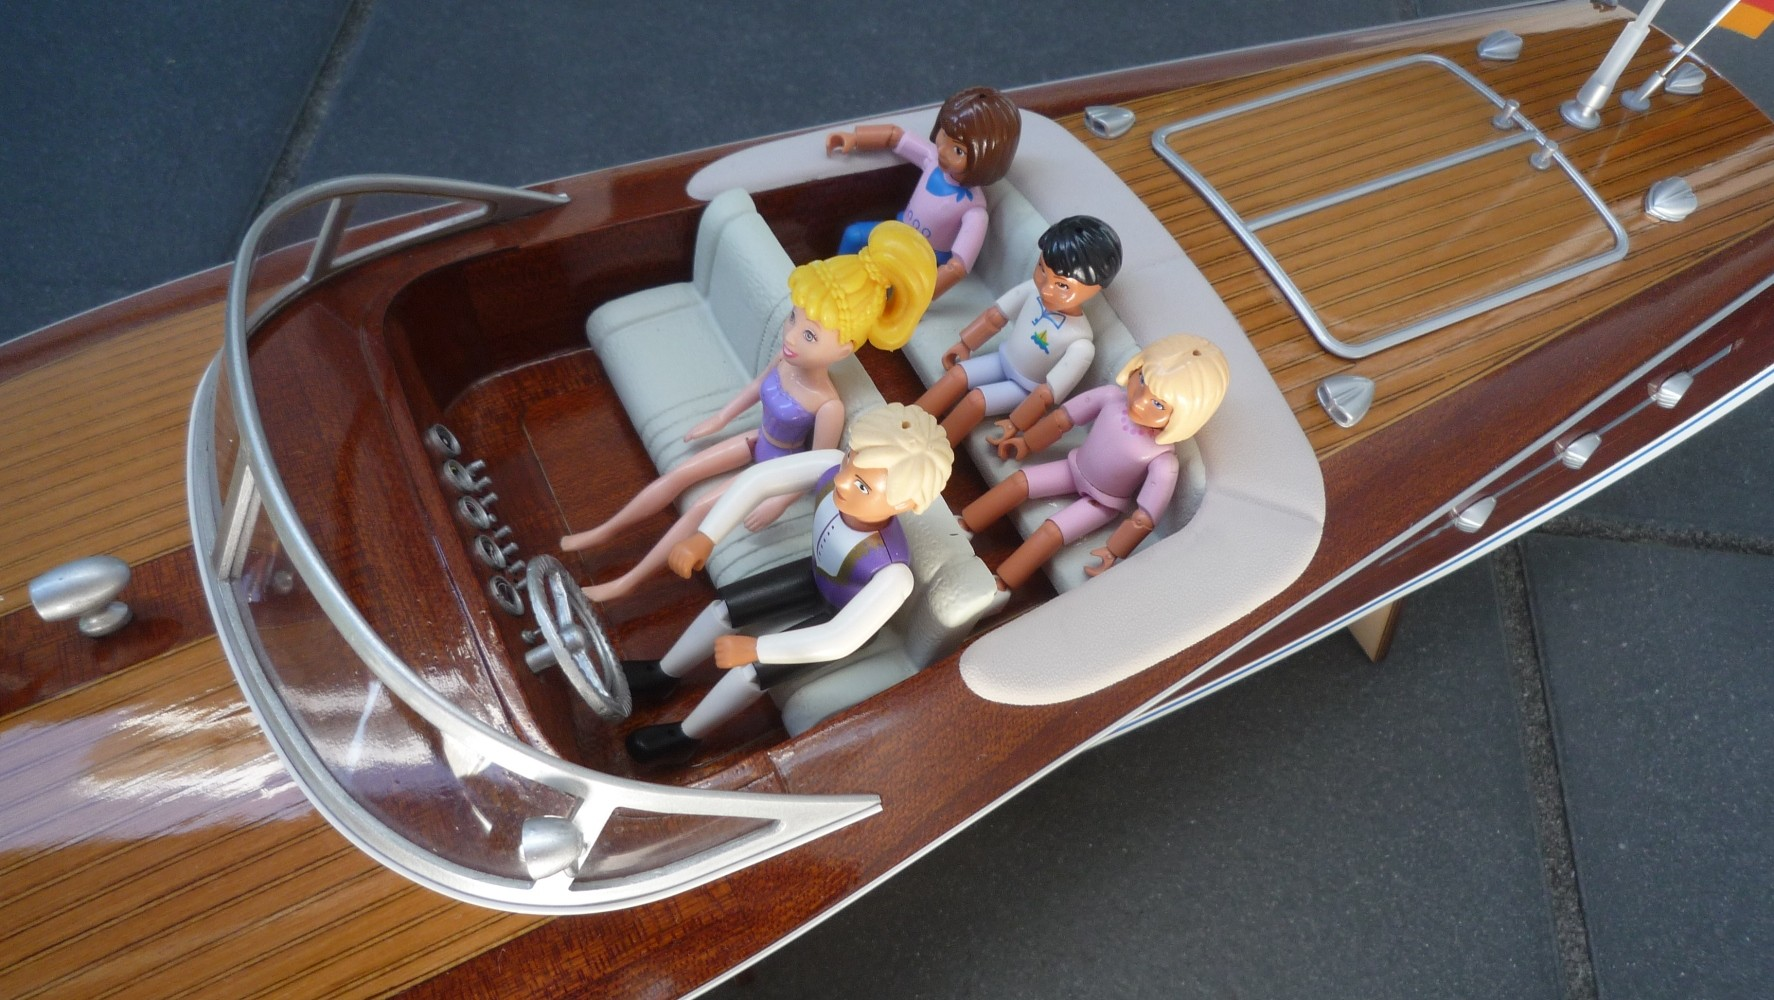 lokschuppen dominik rc modellbau motorboot volere. Black Bedroom Furniture Sets. Home Design Ideas